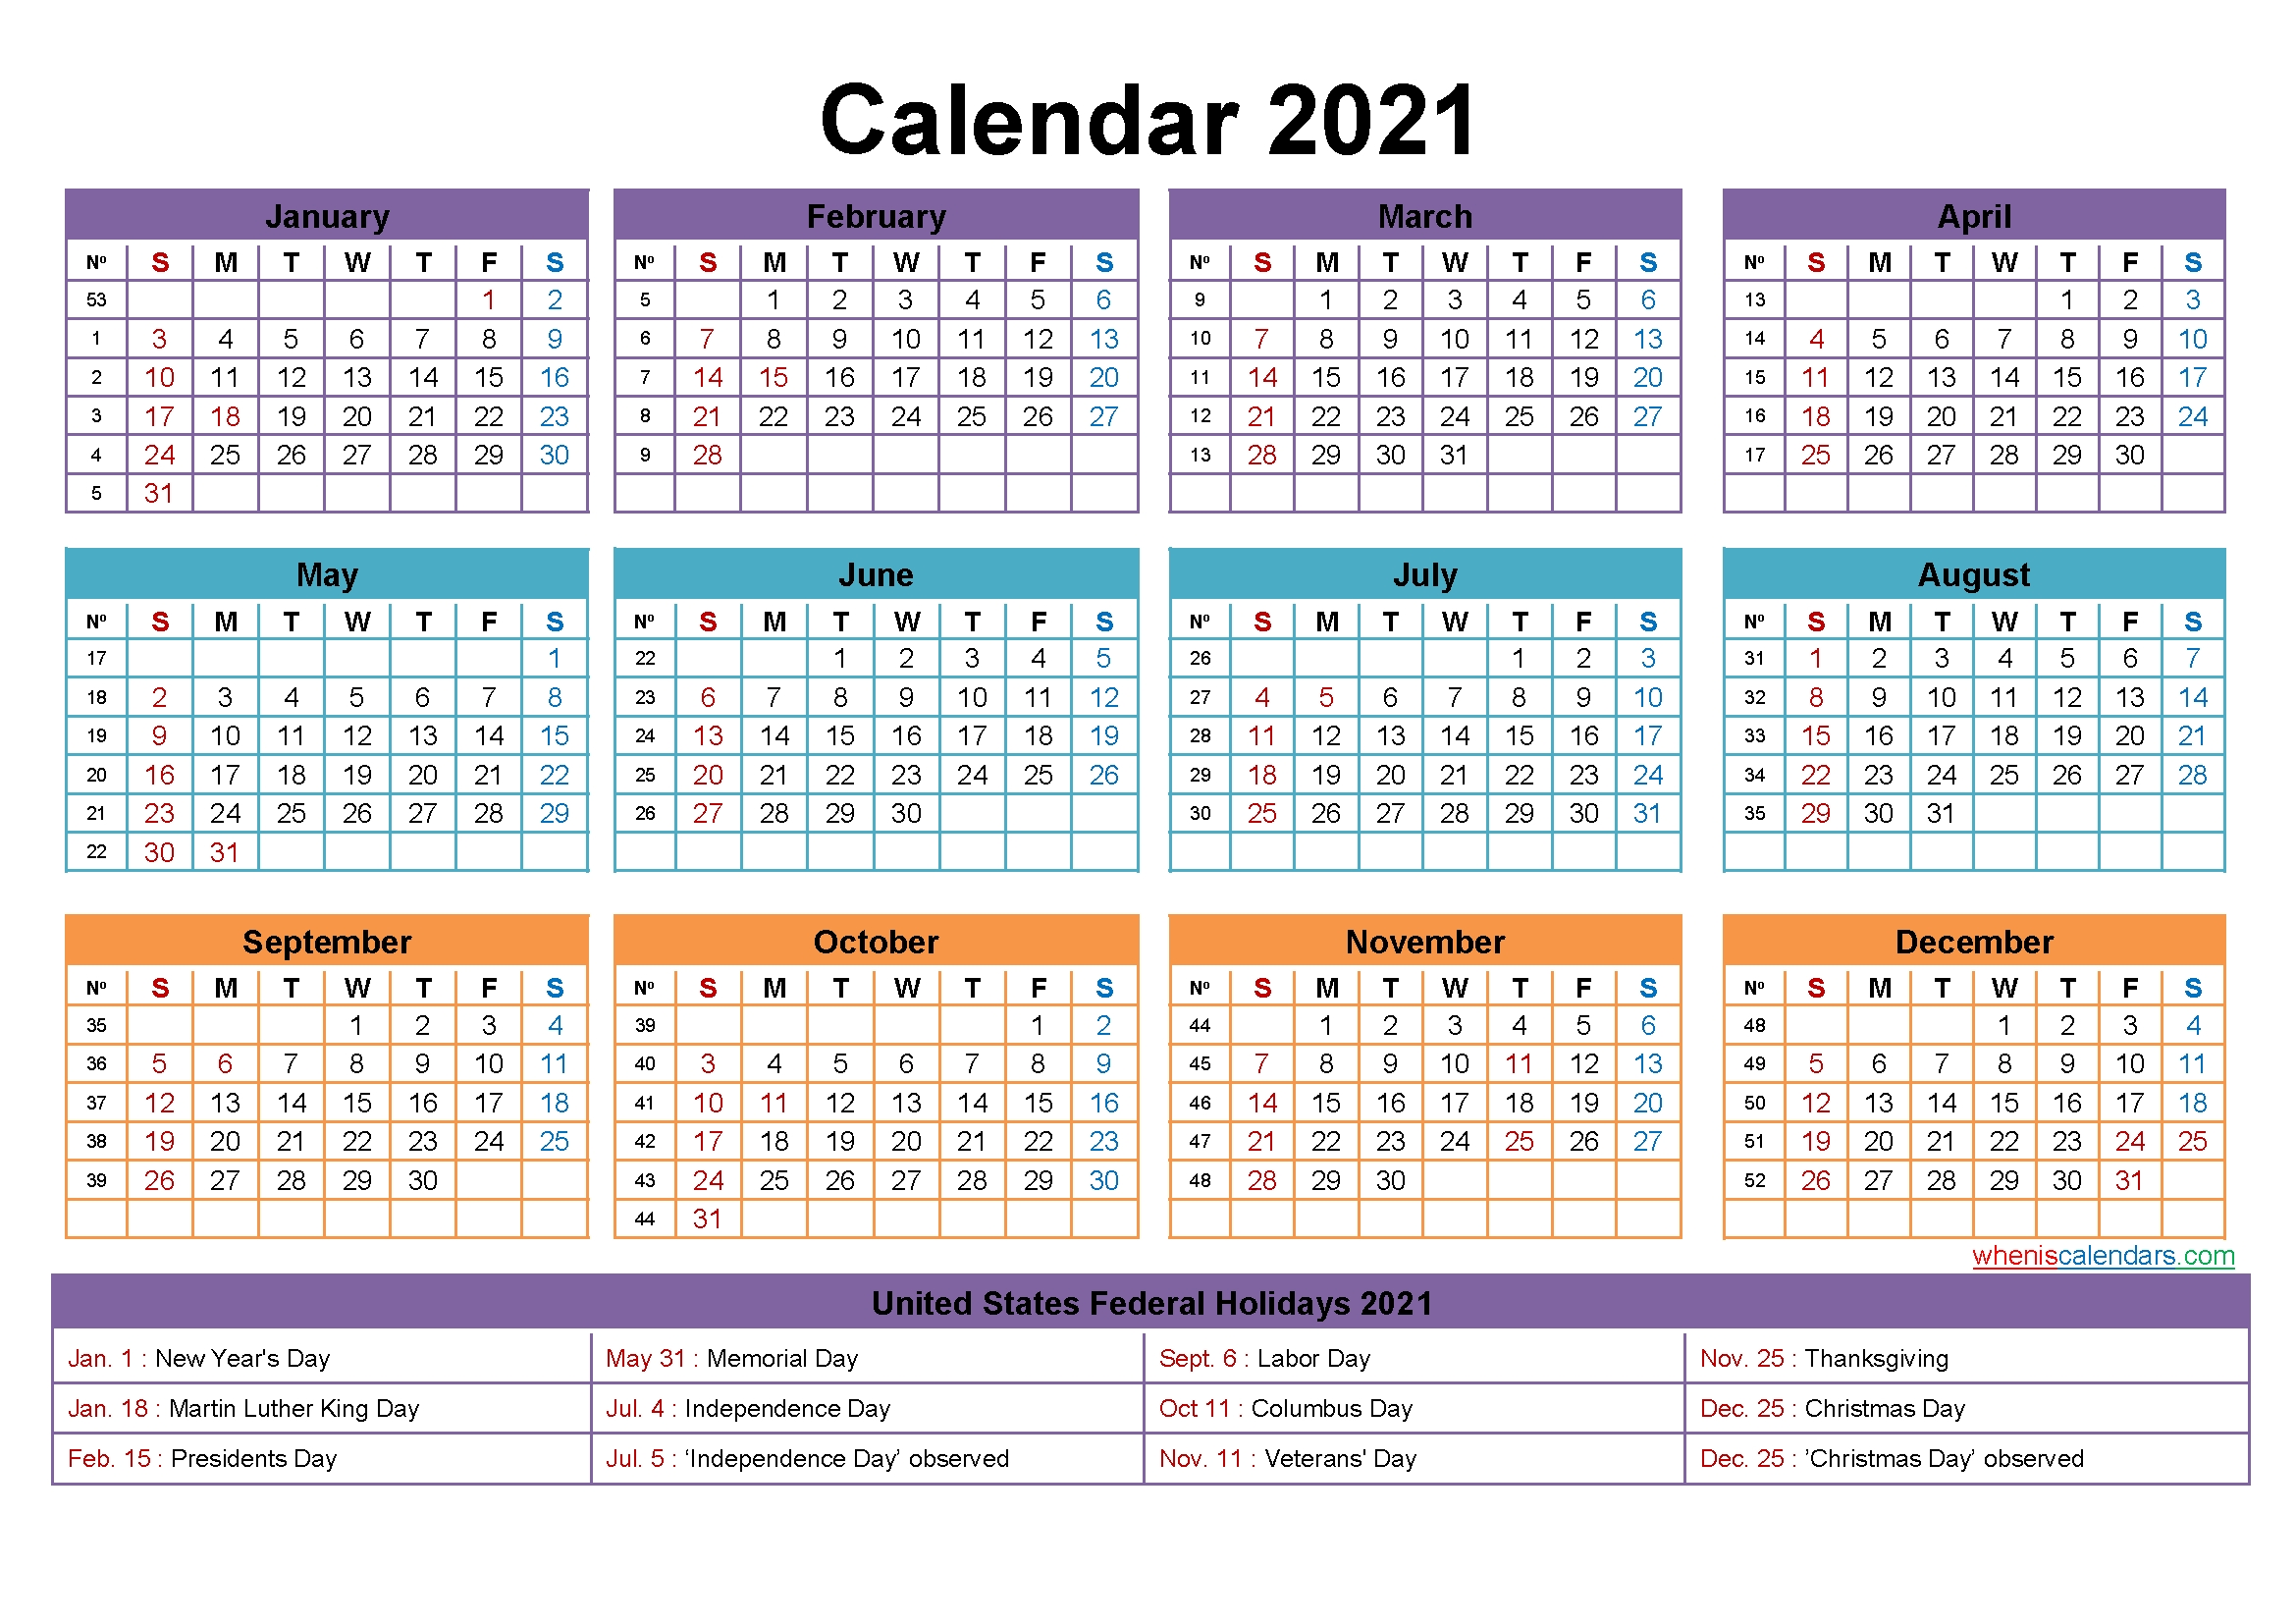 Free Editable 2021 Calendars In Word / Printable Calendar 2021 Template Free Powerpoint regarding Calendar Template 2021 Indesign Image